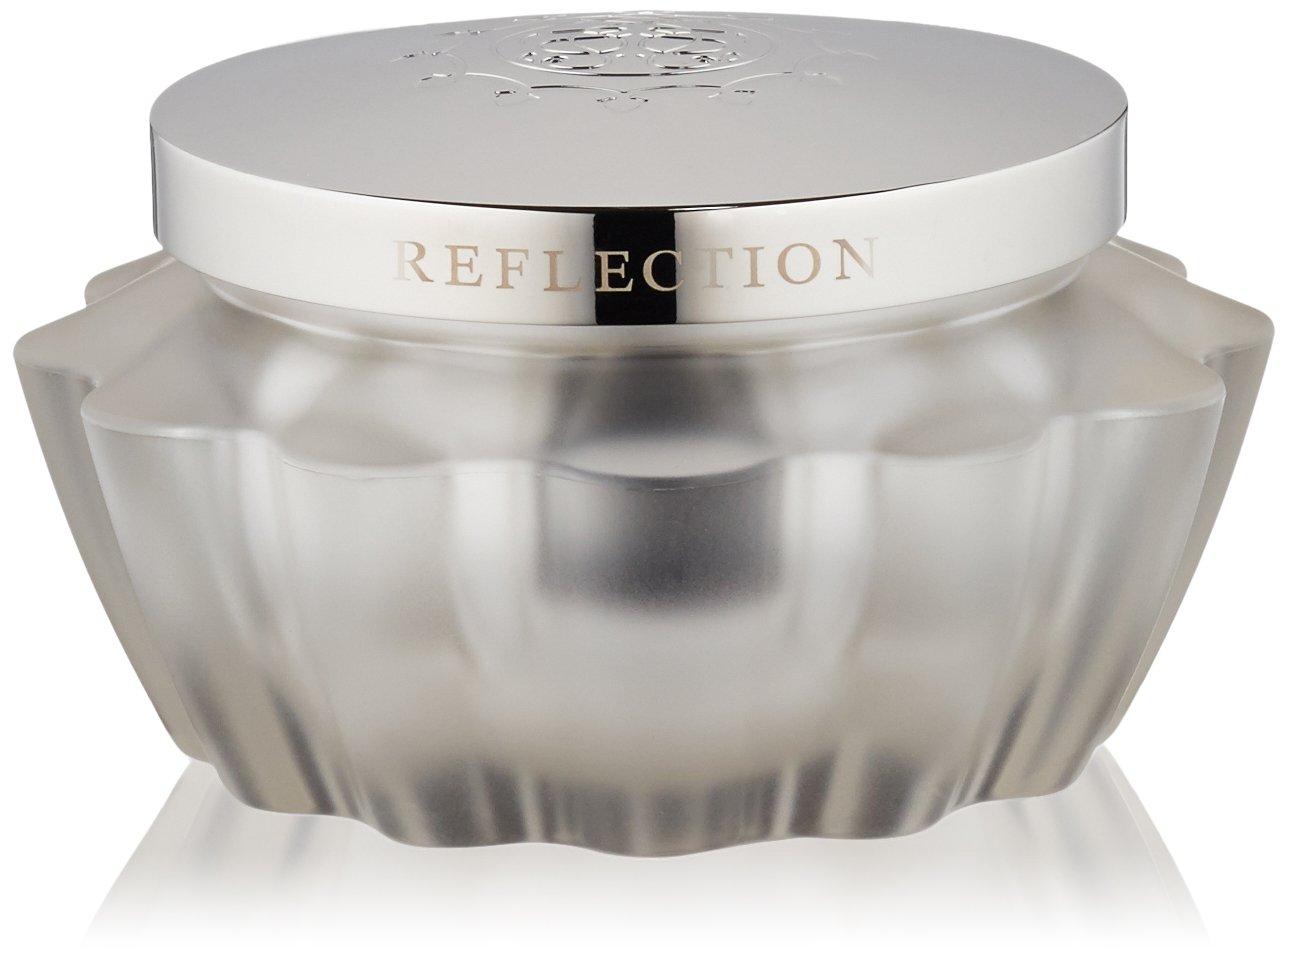 AMOUAGE Reflection Women's Body Cream, 6.8 fl. oz.